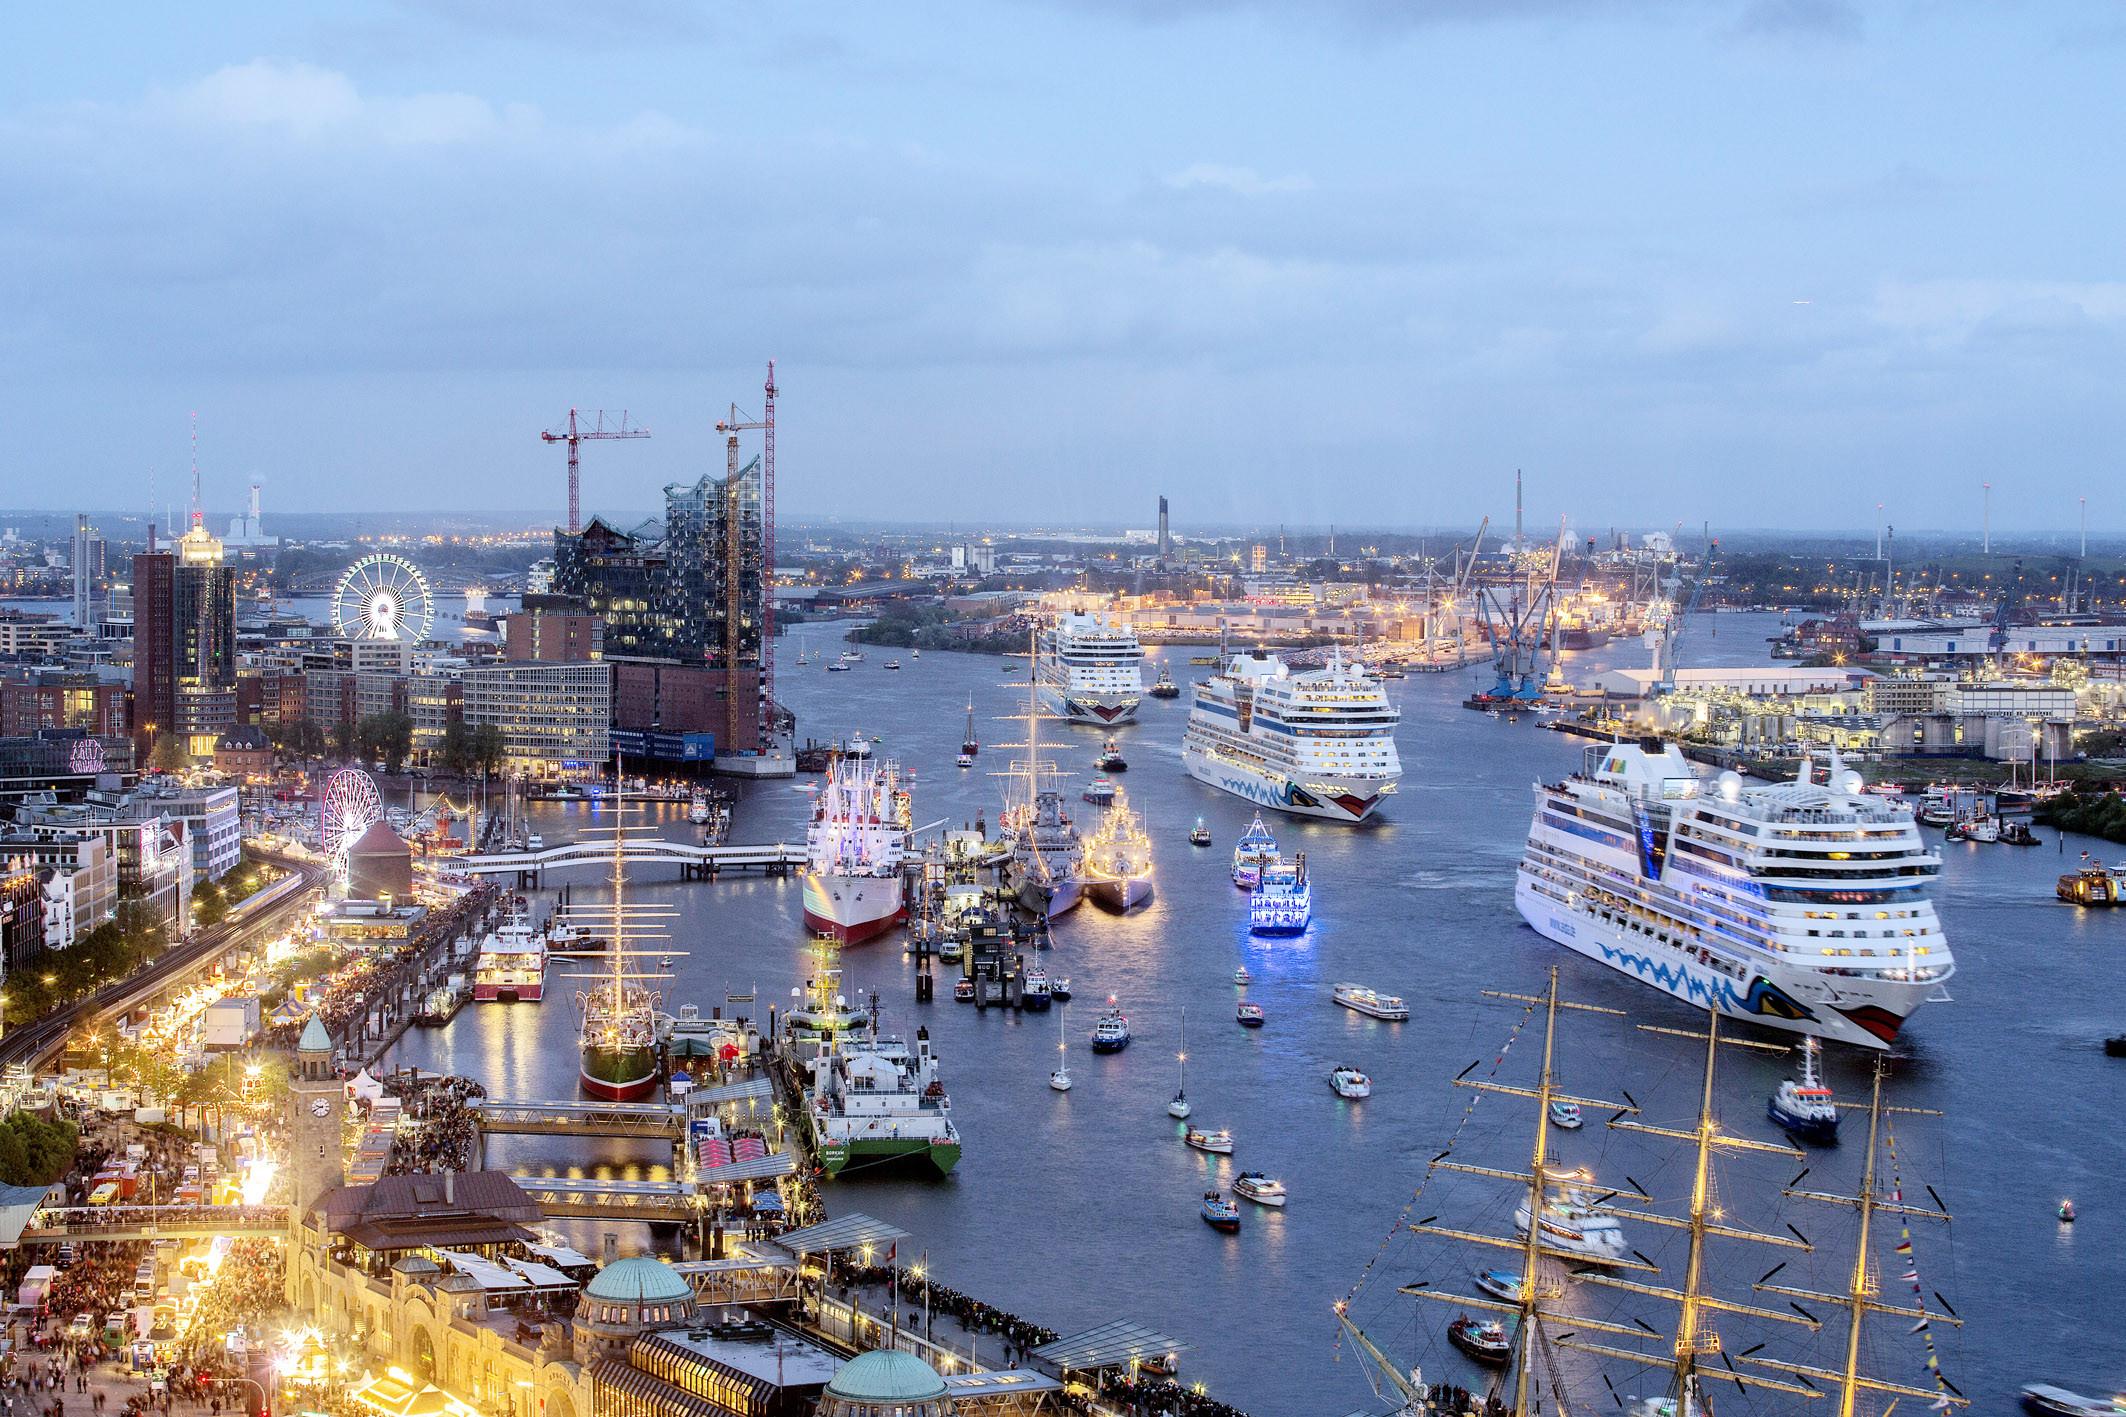 Aidamar Start Cruiseseizoen In Rotterdam 171 Cruisereiziger